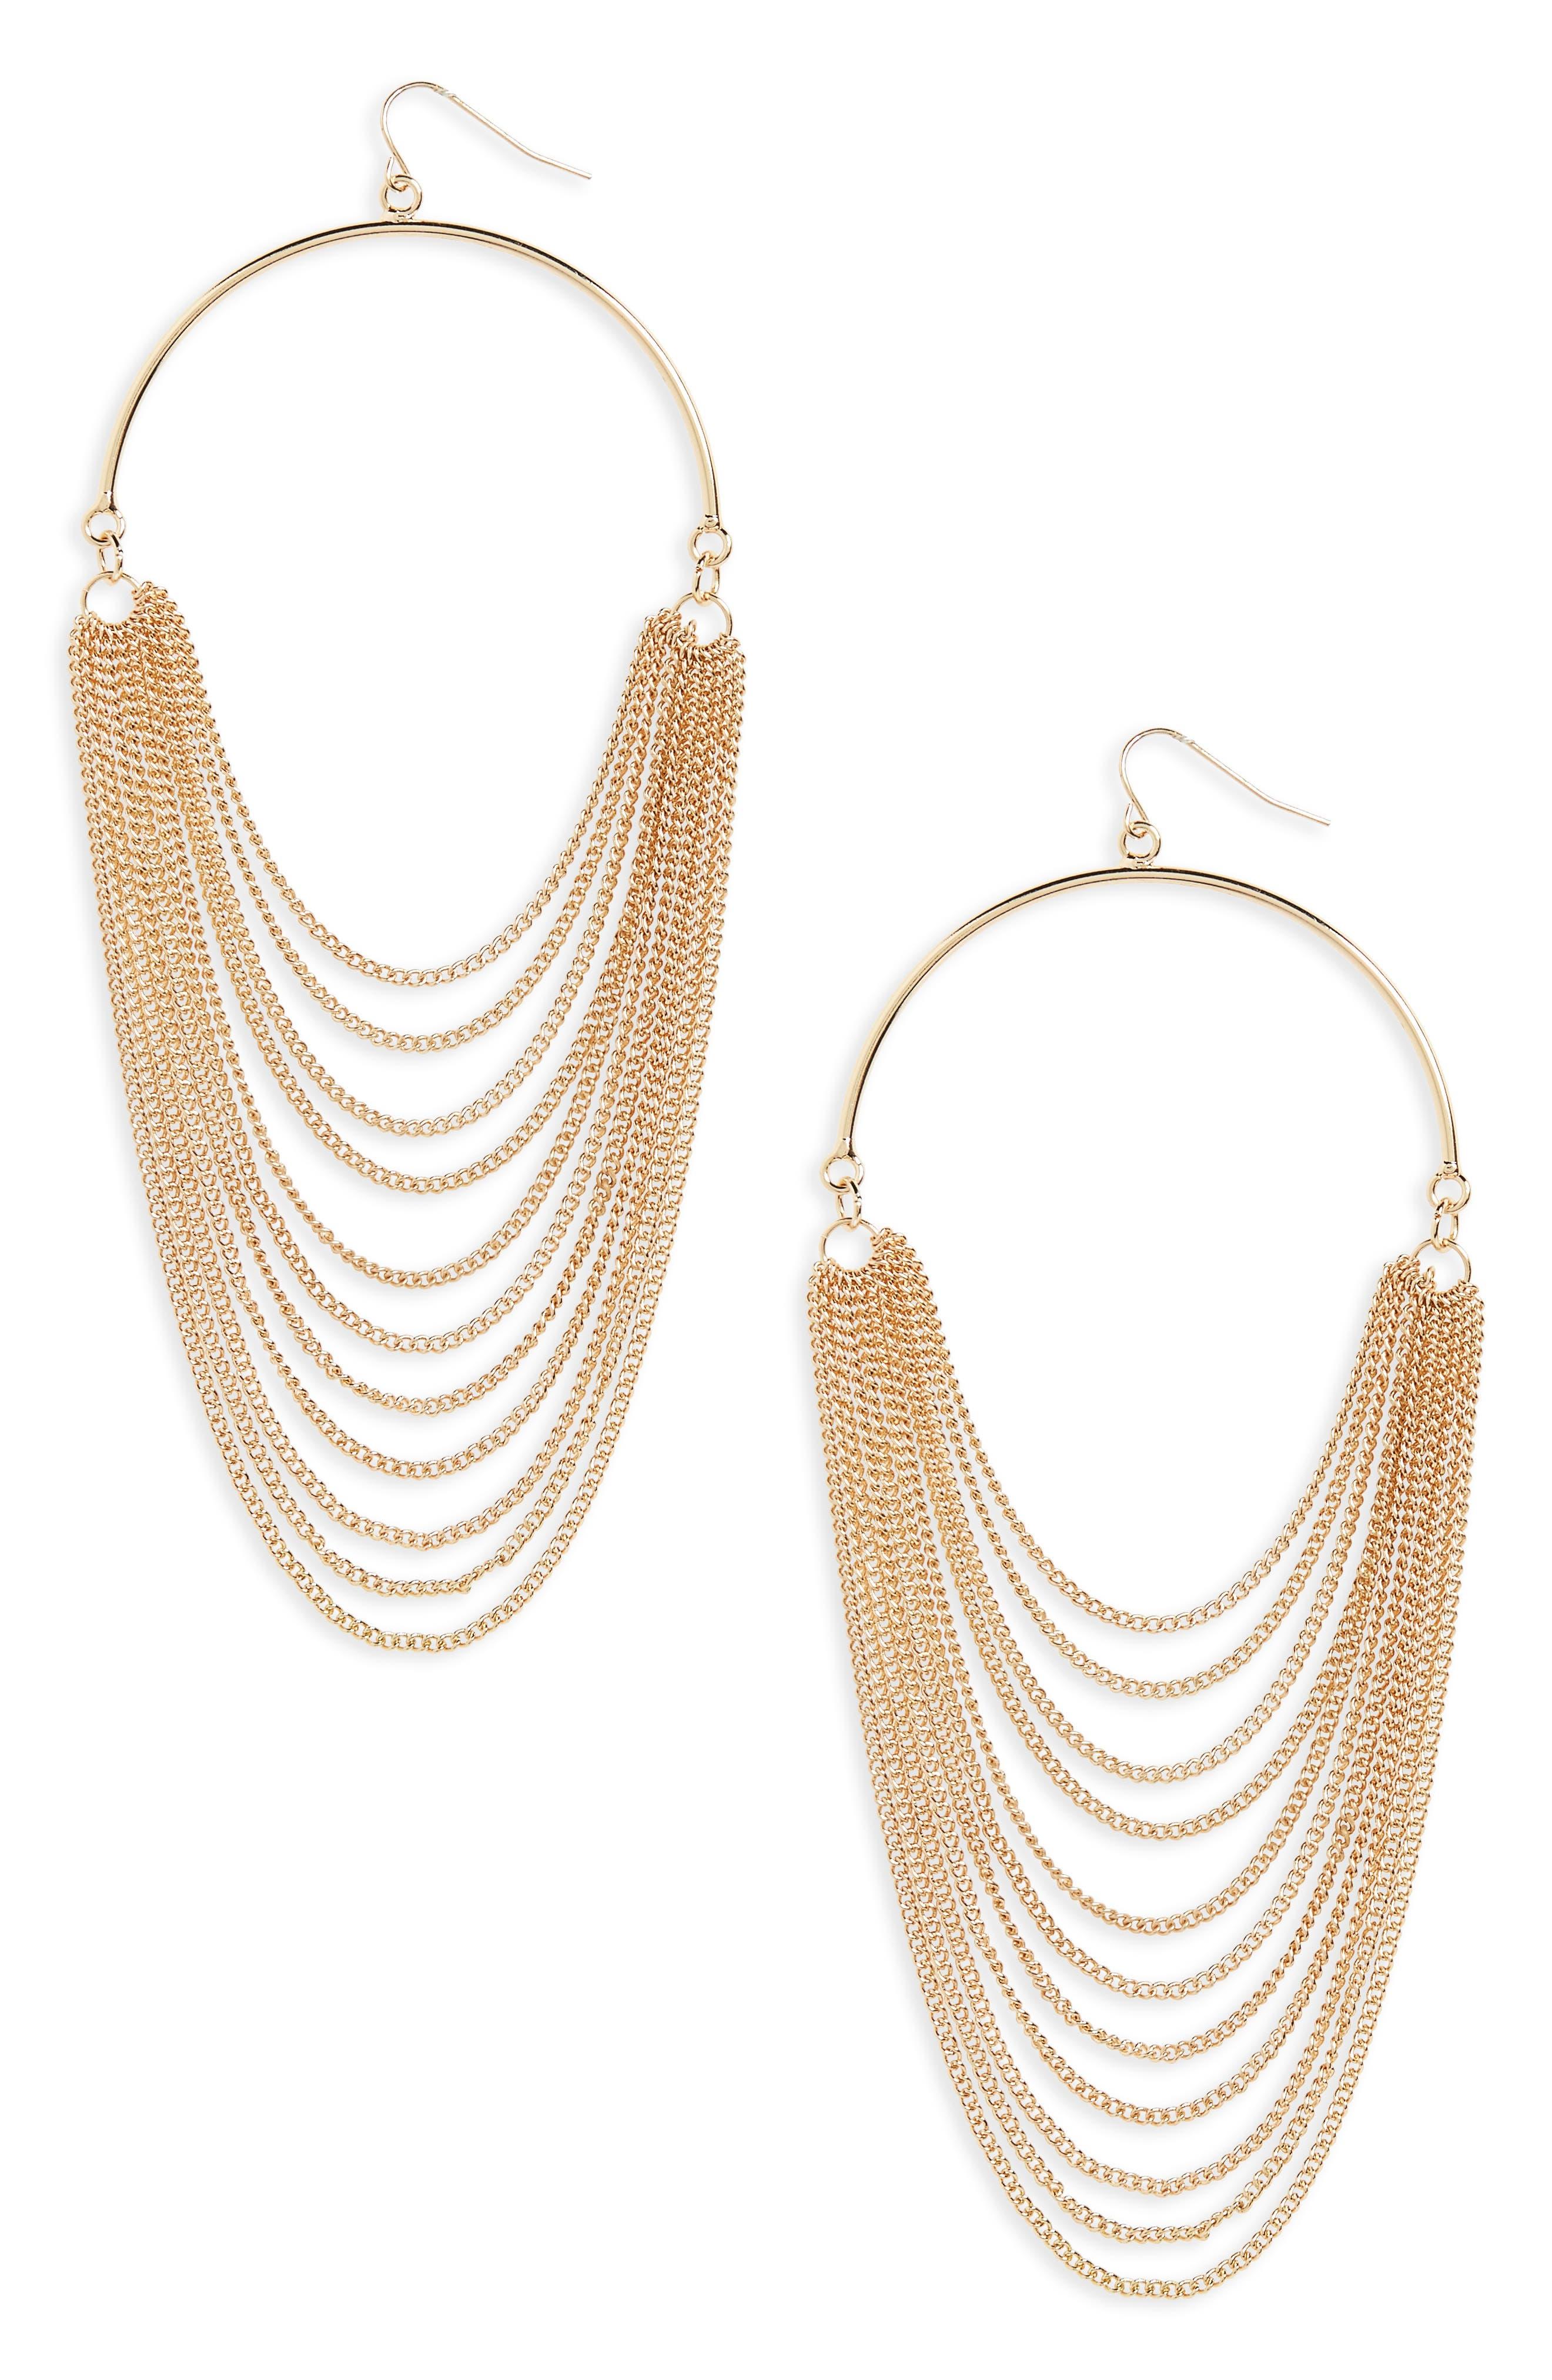 Main Image - Natasha Layered Chain Hoop Earrings